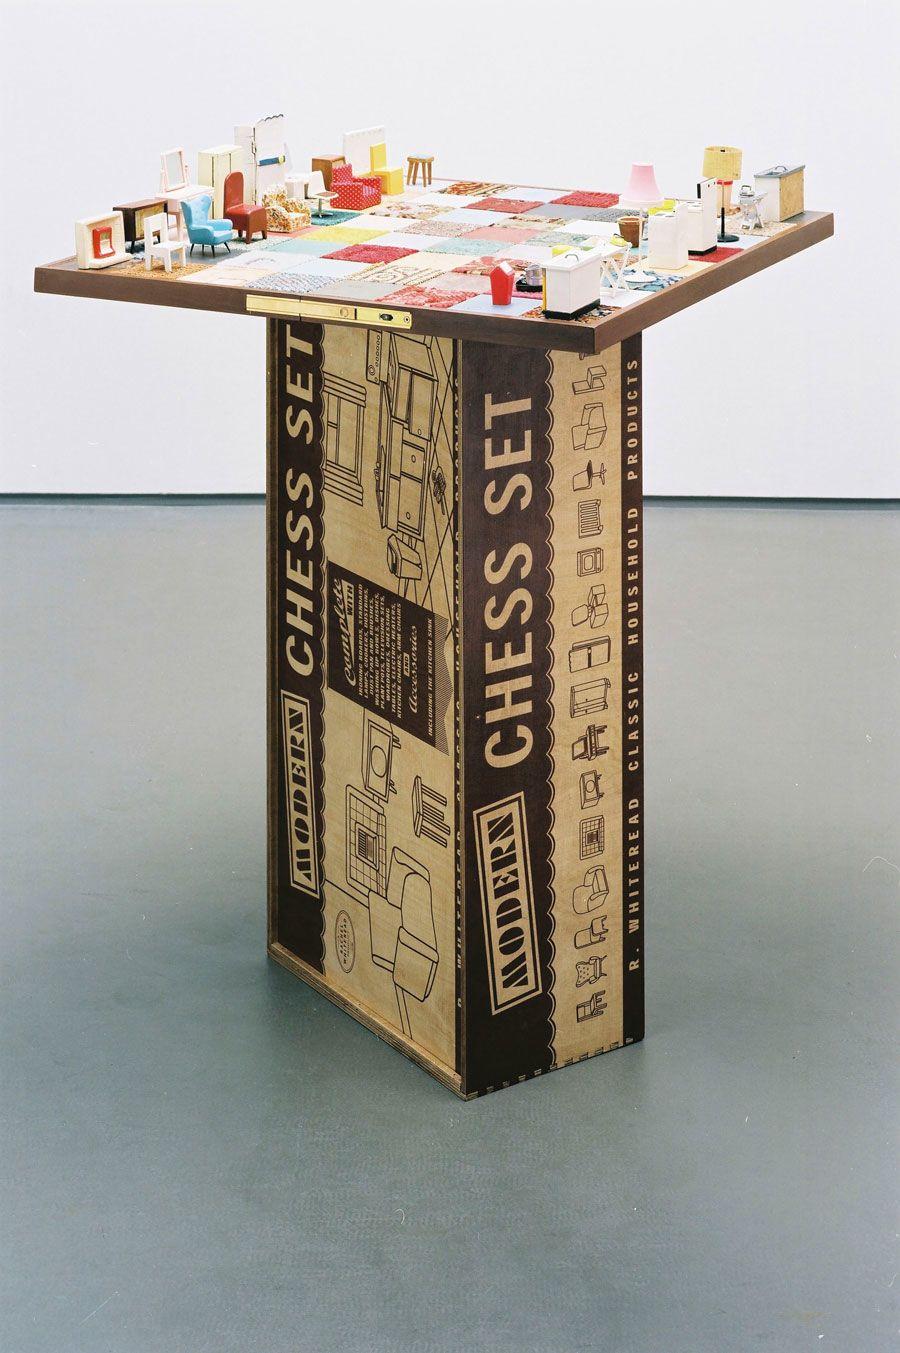 Rachel Whiteread (b. 1963), Modern Chess Set. Box 245 x 750 x 415 mm. Estimate: £10,000-15,000. Offered in Prints & Multiples on 18 September 2019 at Christie's in London